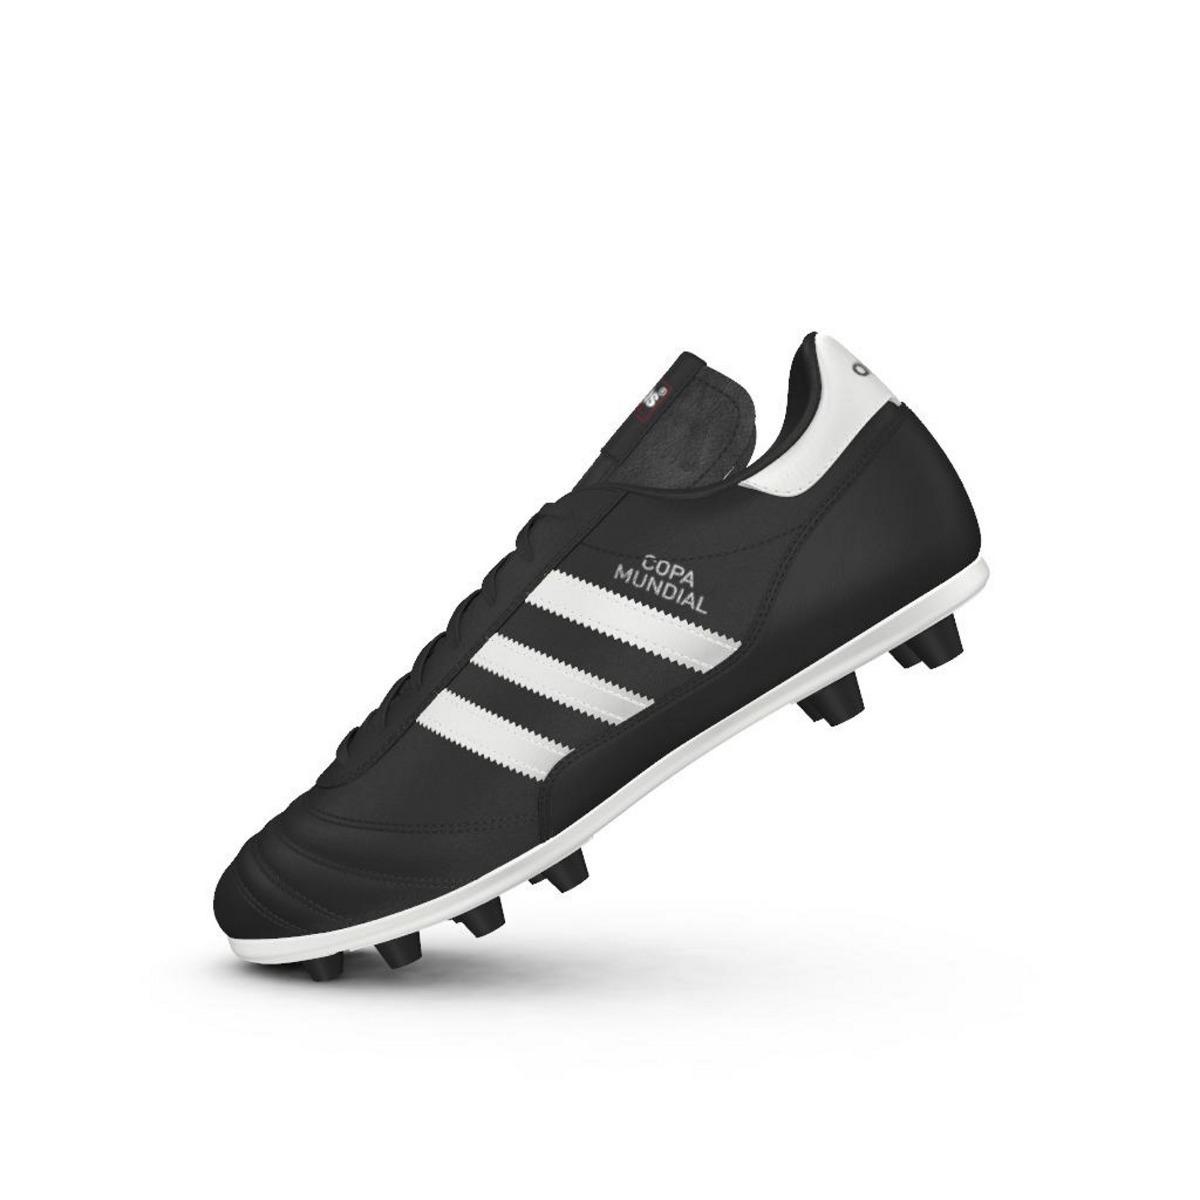 c639a3d51738c Zapatos De Fútbol adidas Copa Mundial   Rincón Del Fútbol -   99.990 ...